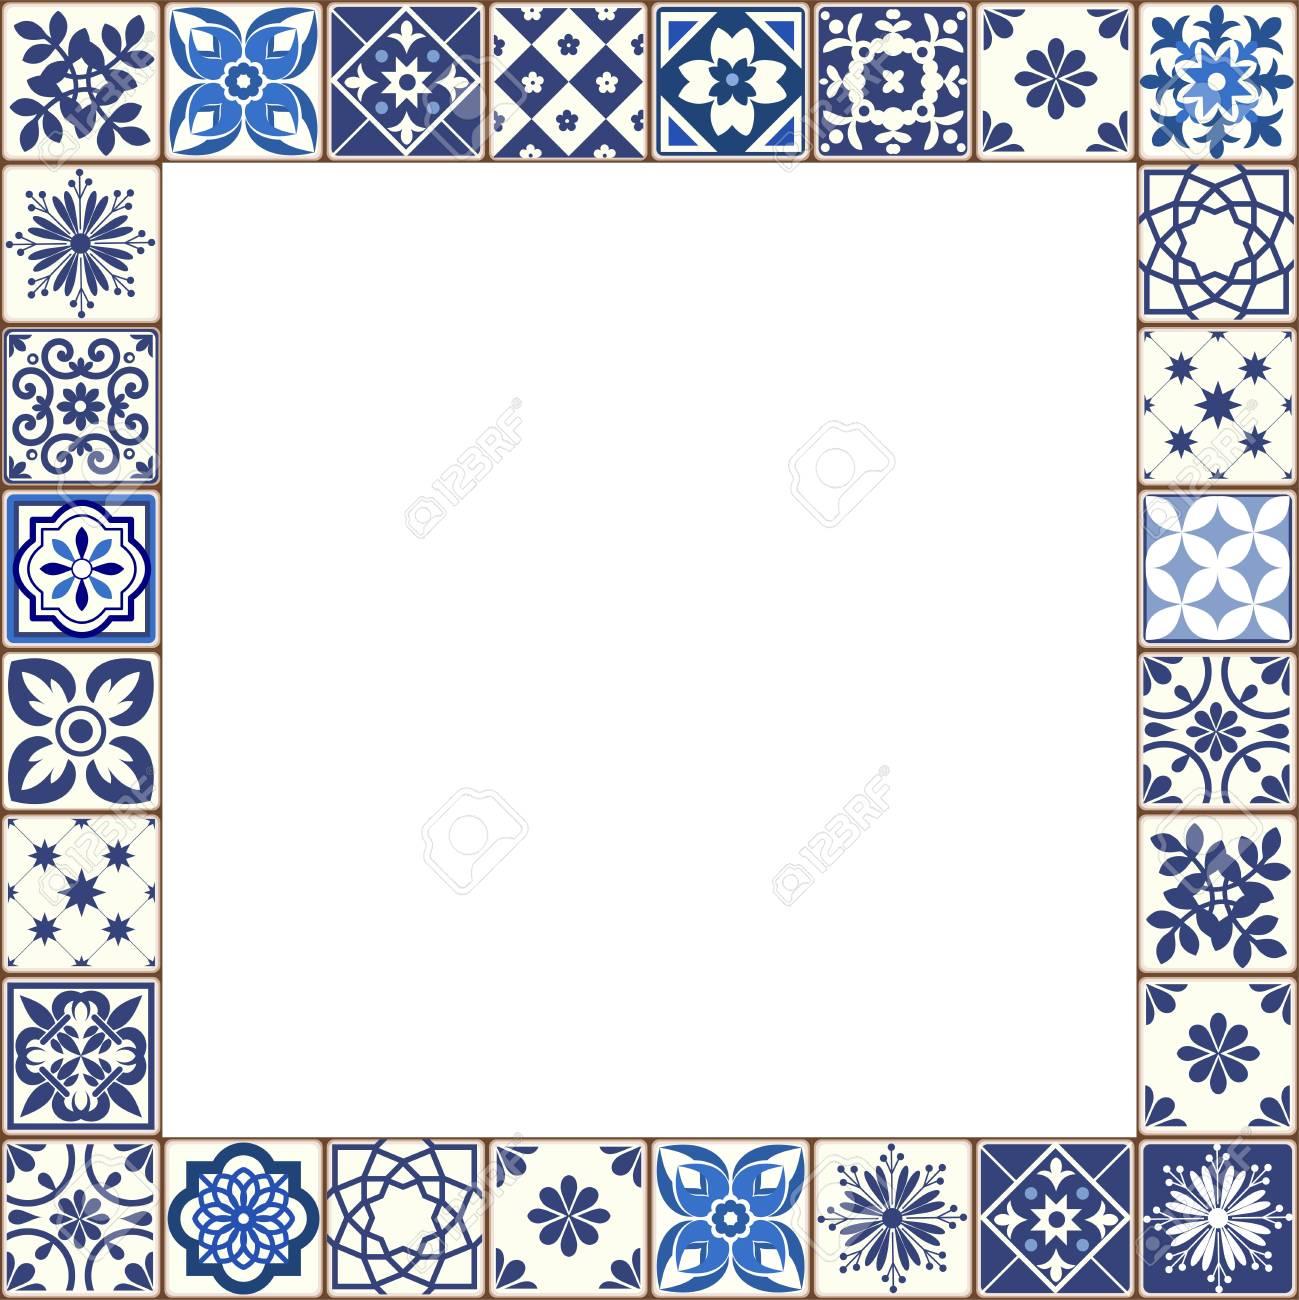 beautiful azulejo tiles vector frame